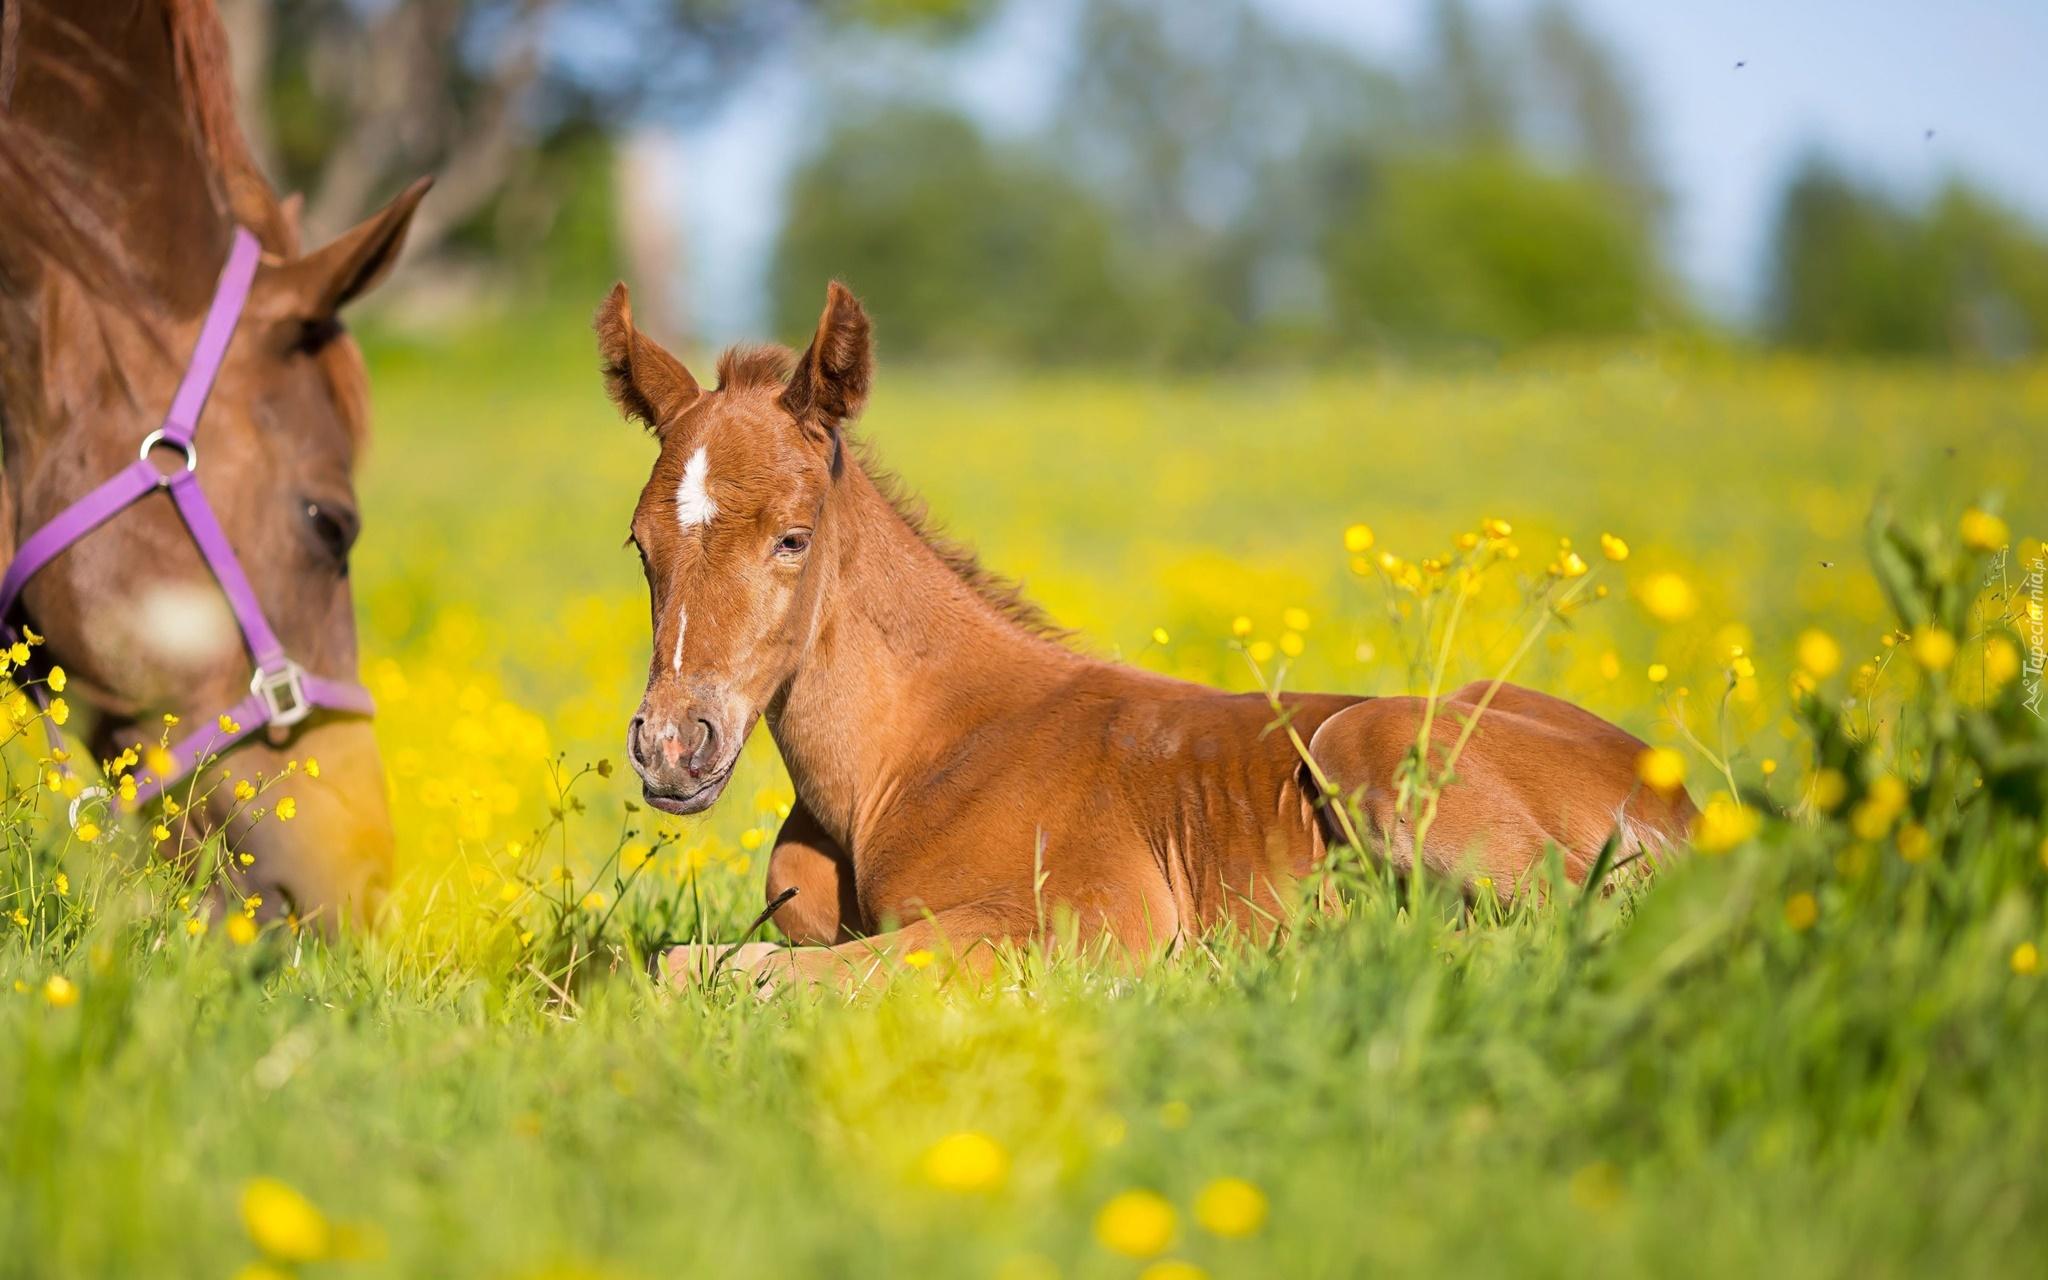 лошадка и жеребенок